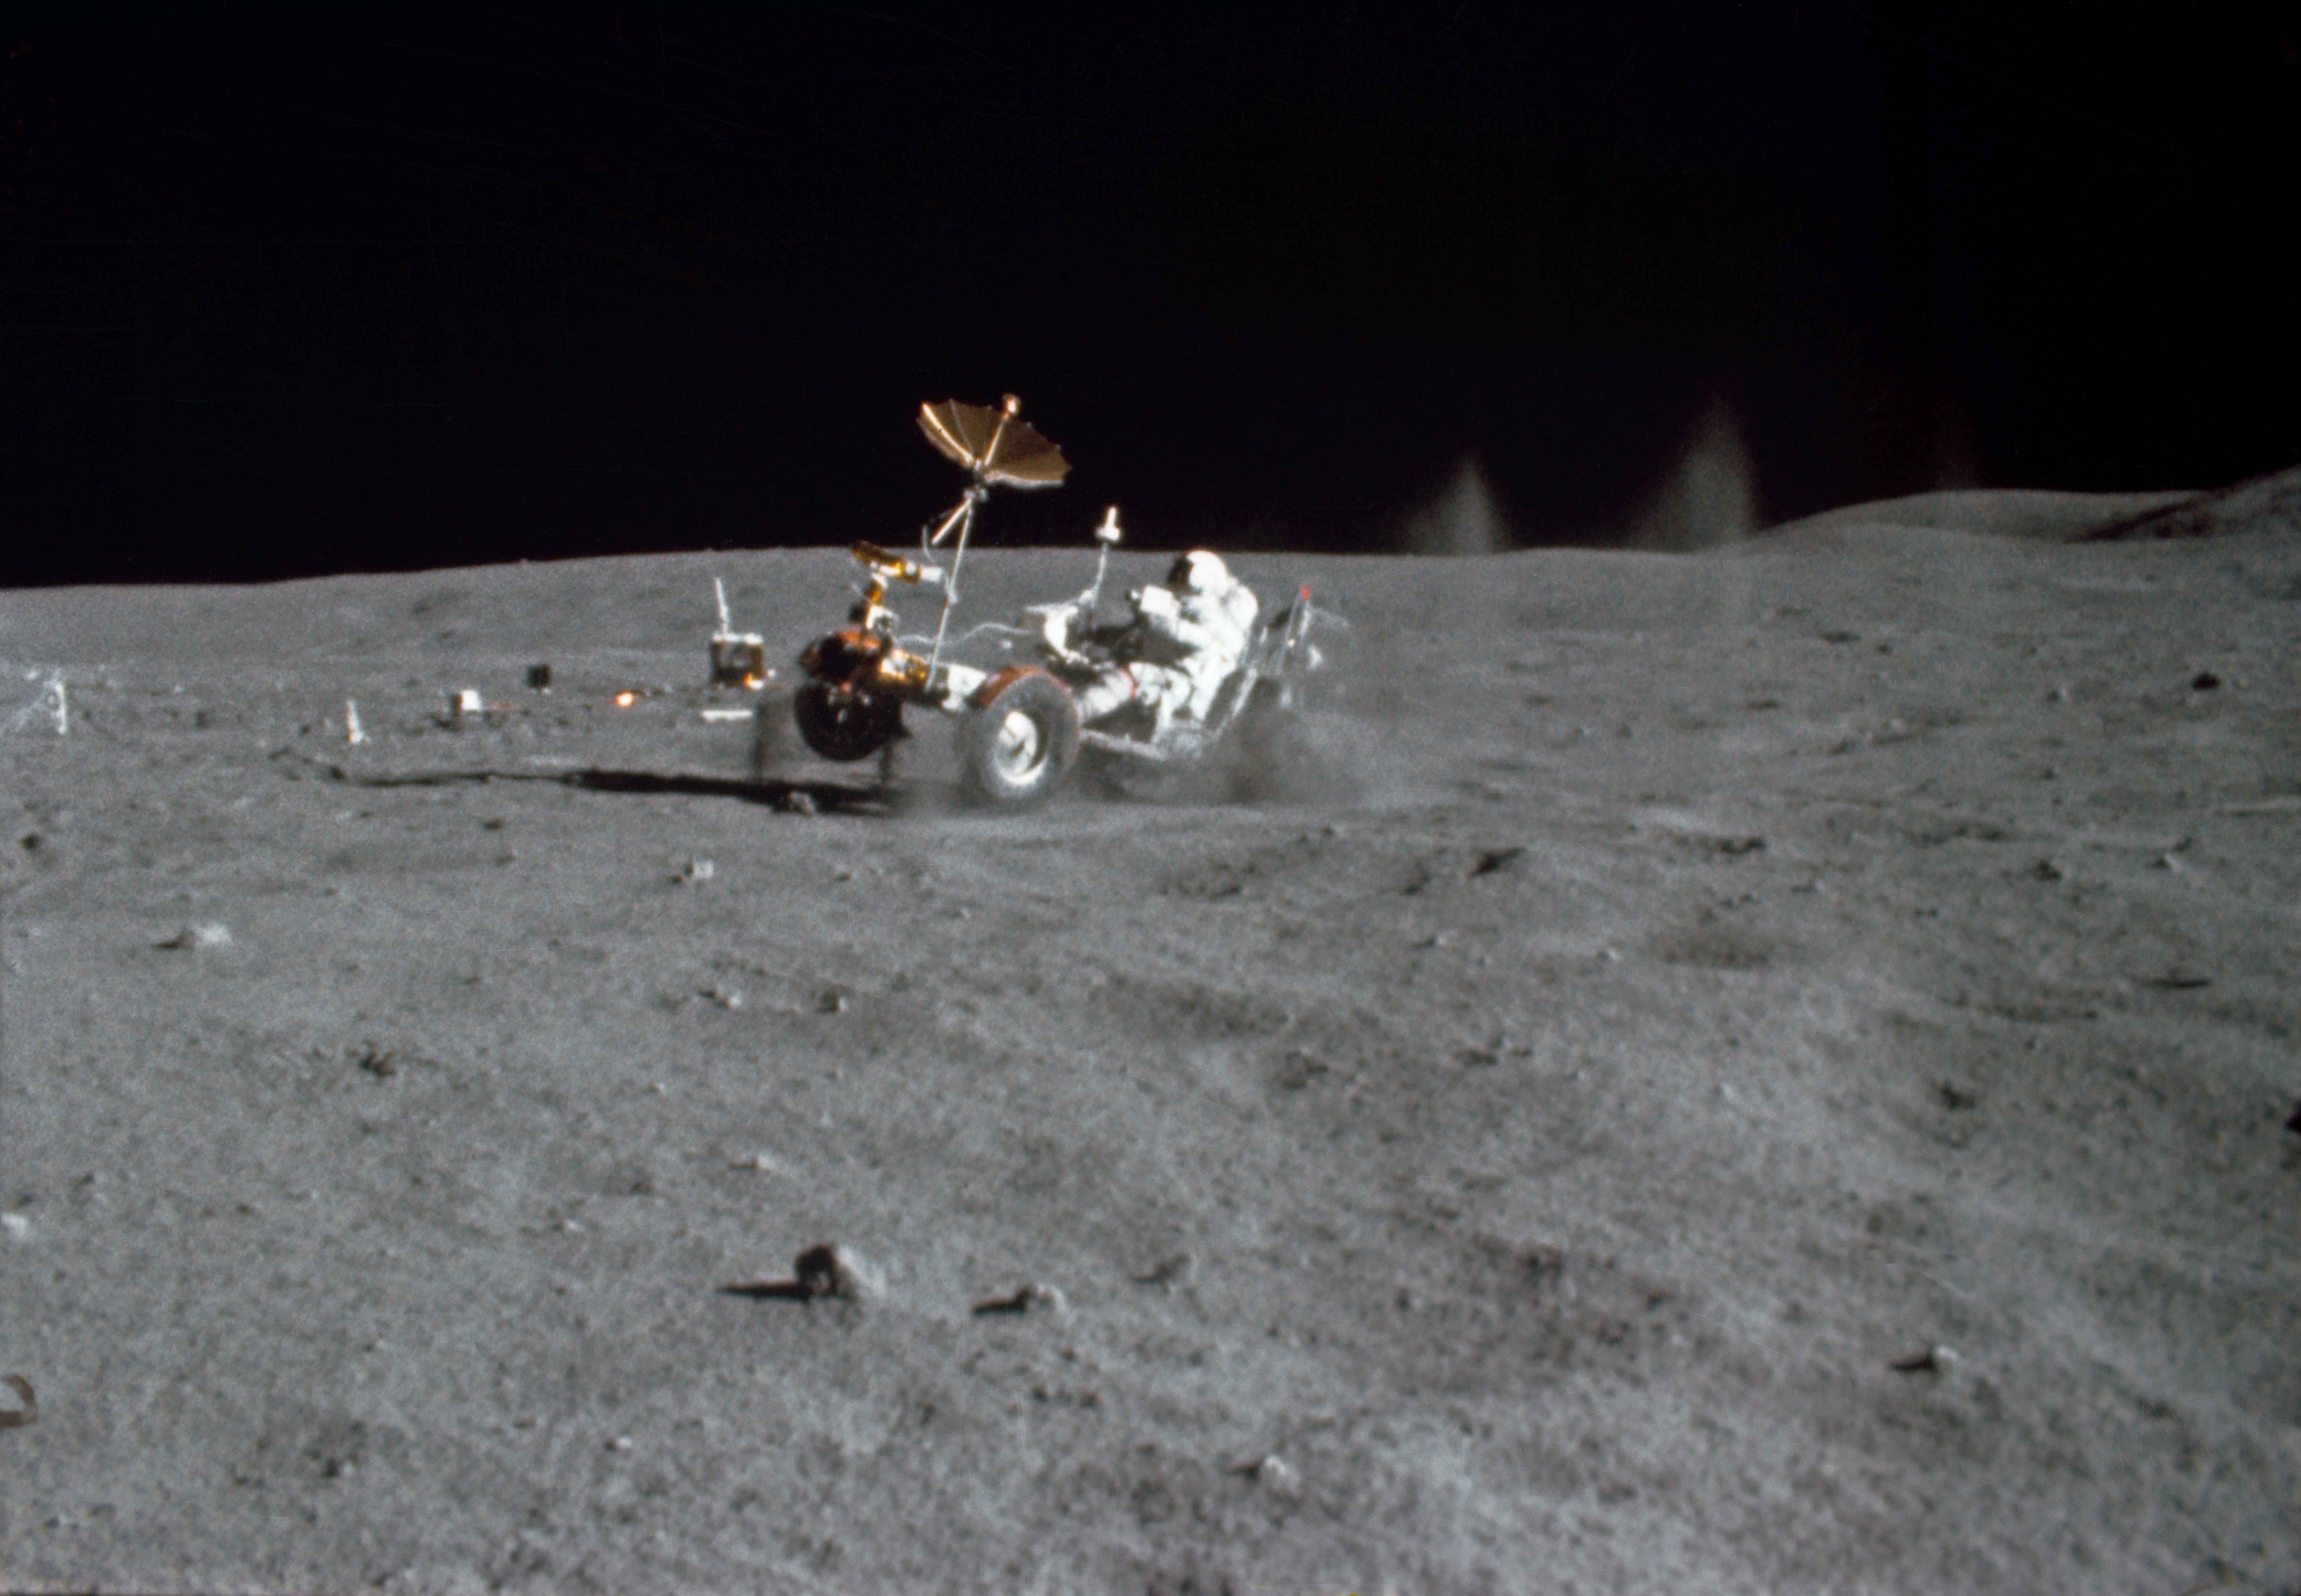 apollo and space shuttle astronauts - photo #31